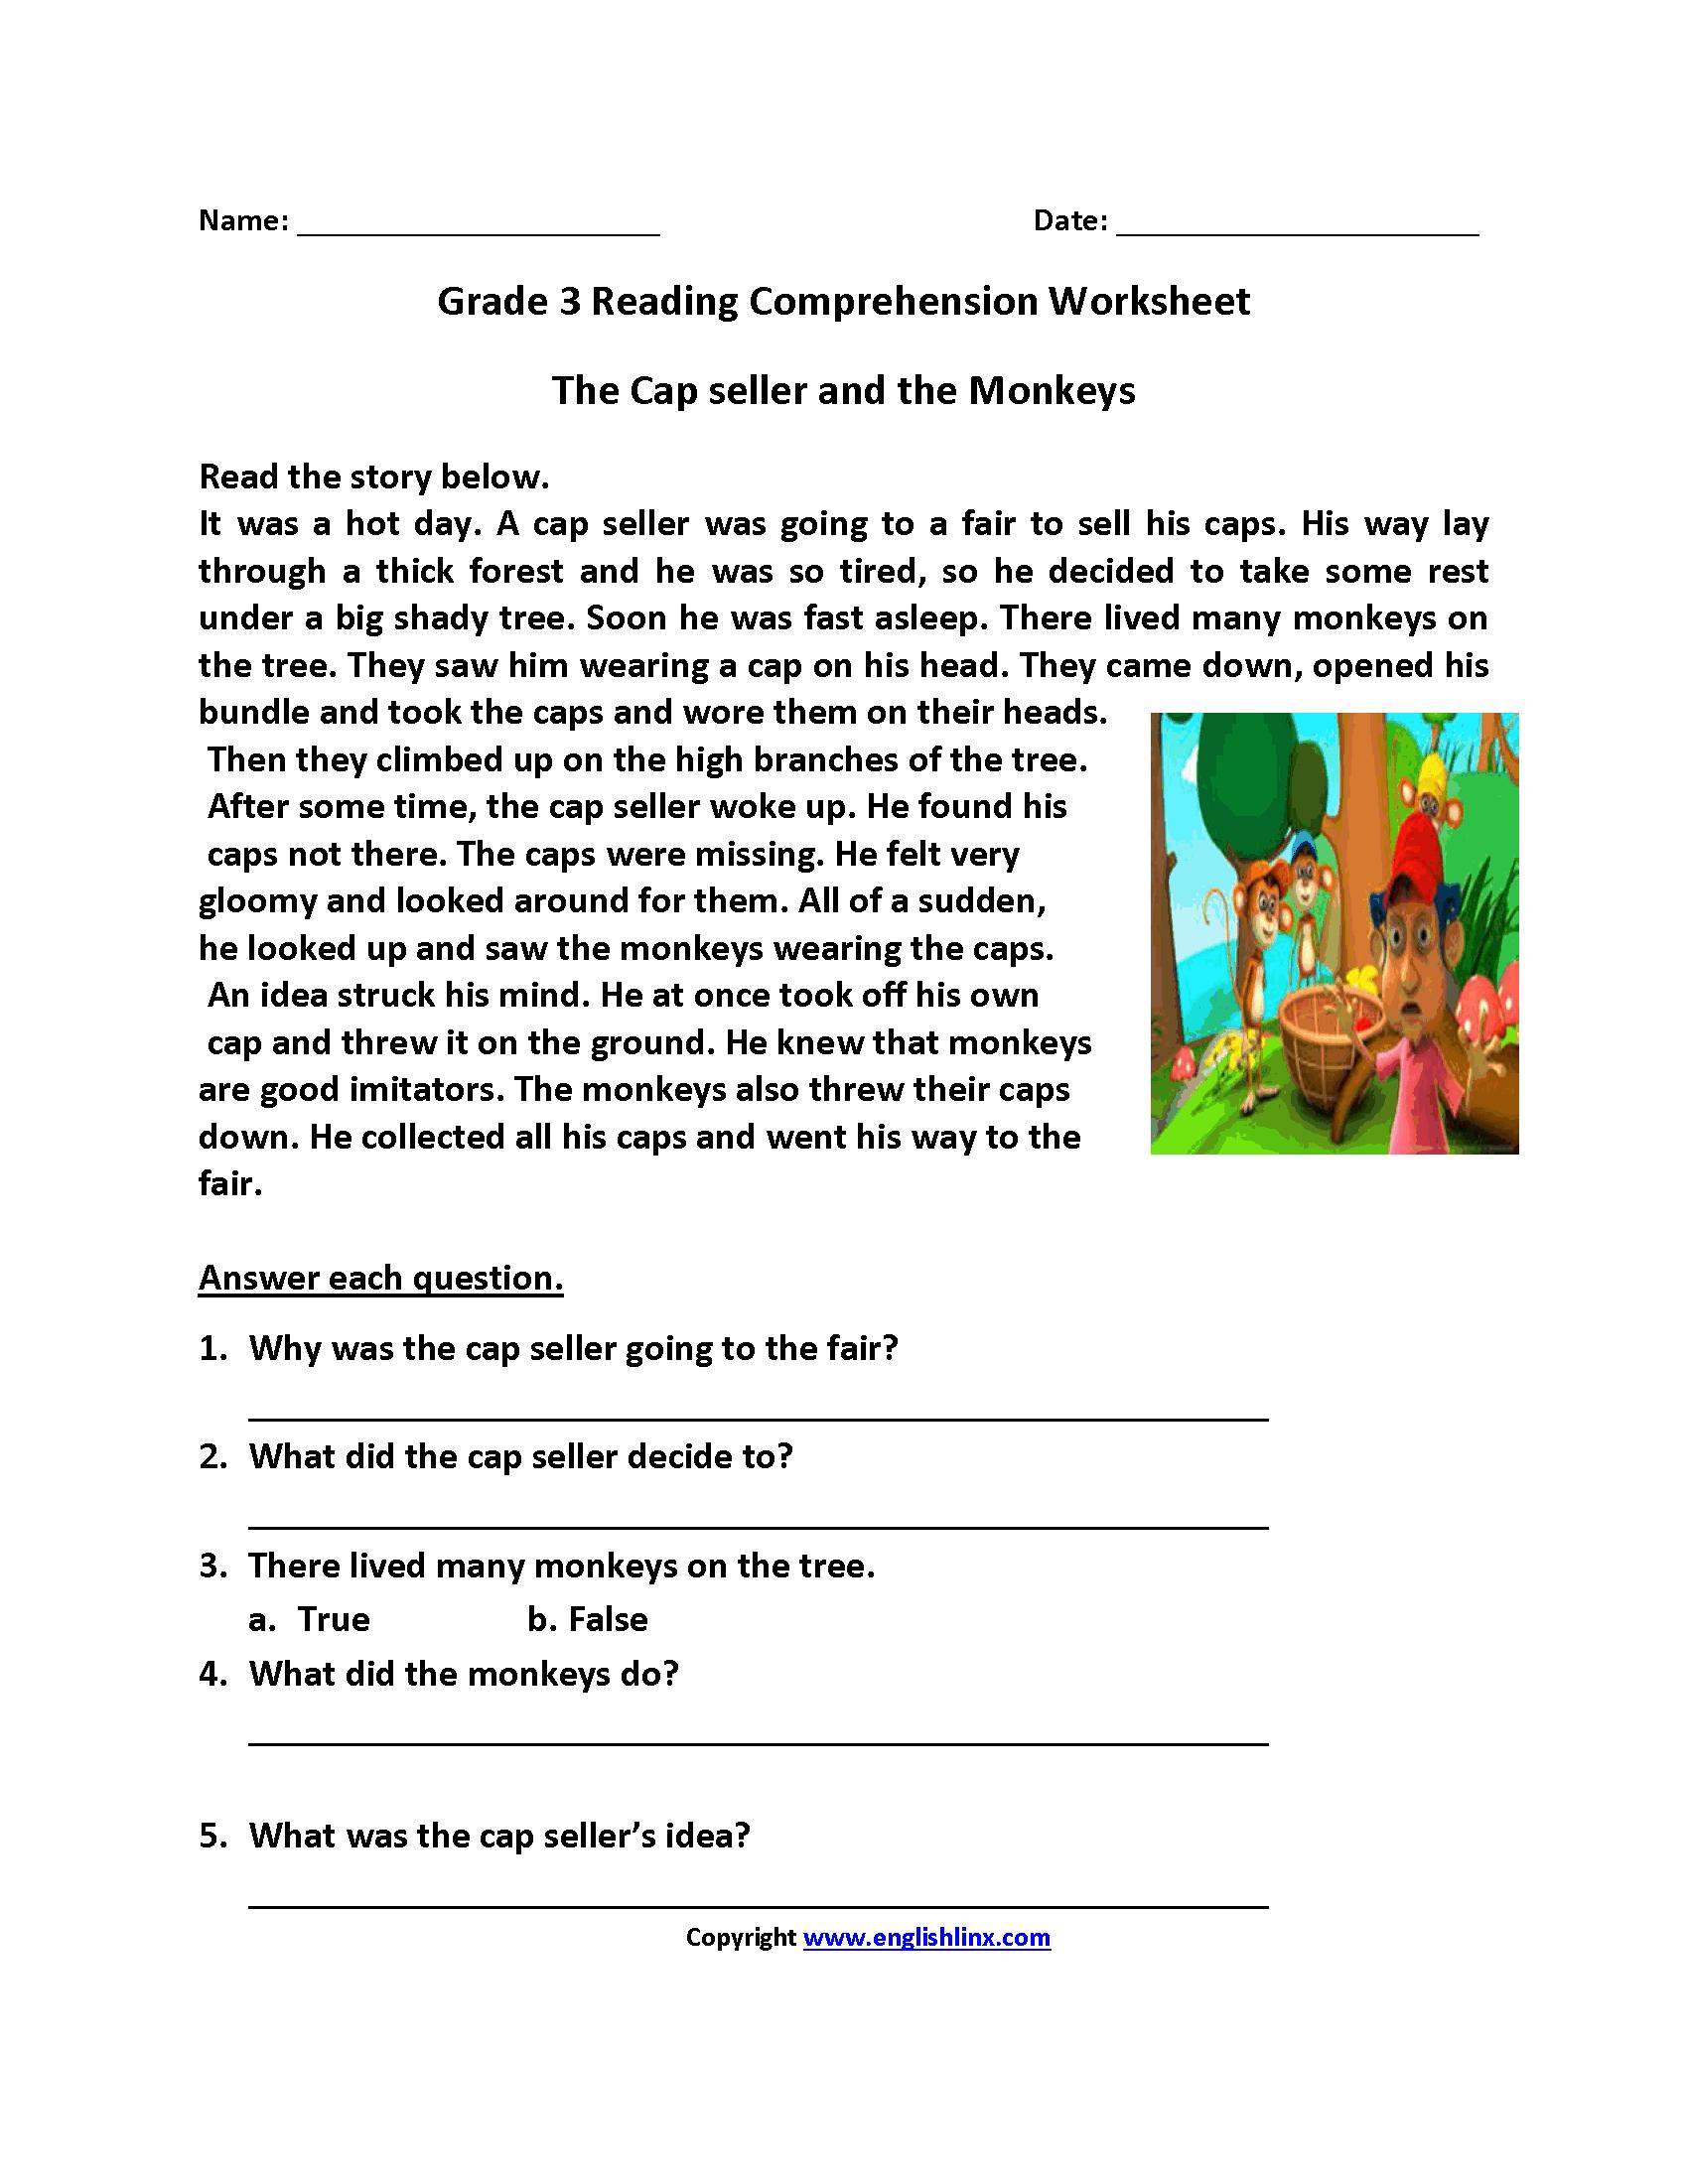 Free Reading Comprehension Worksheets For 3rd Grade